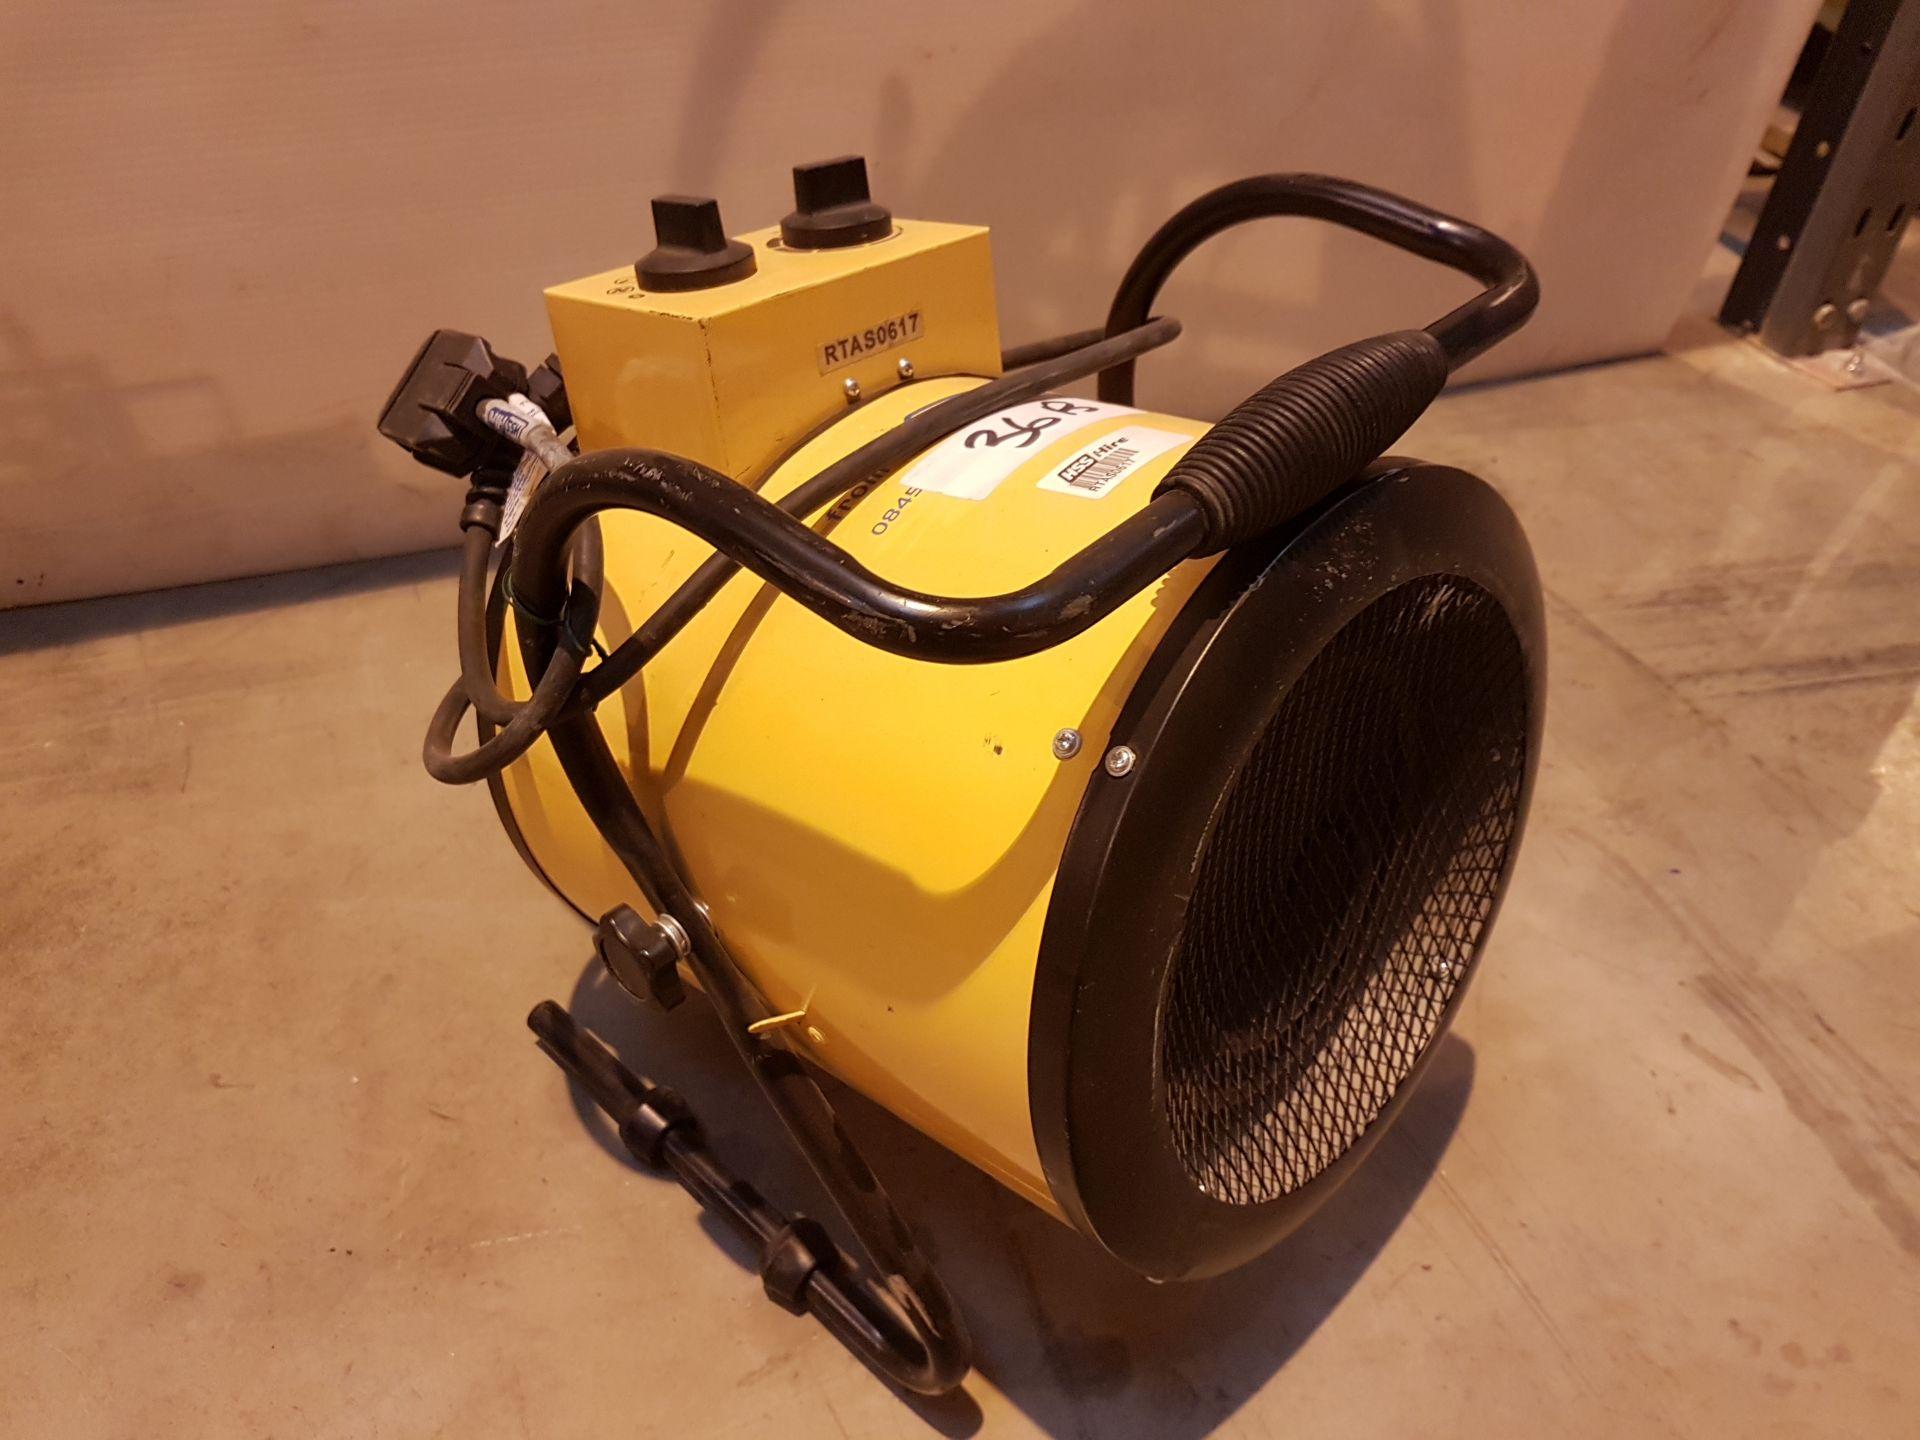 Lot 36 - 240v Retail Heater rtas0617, working